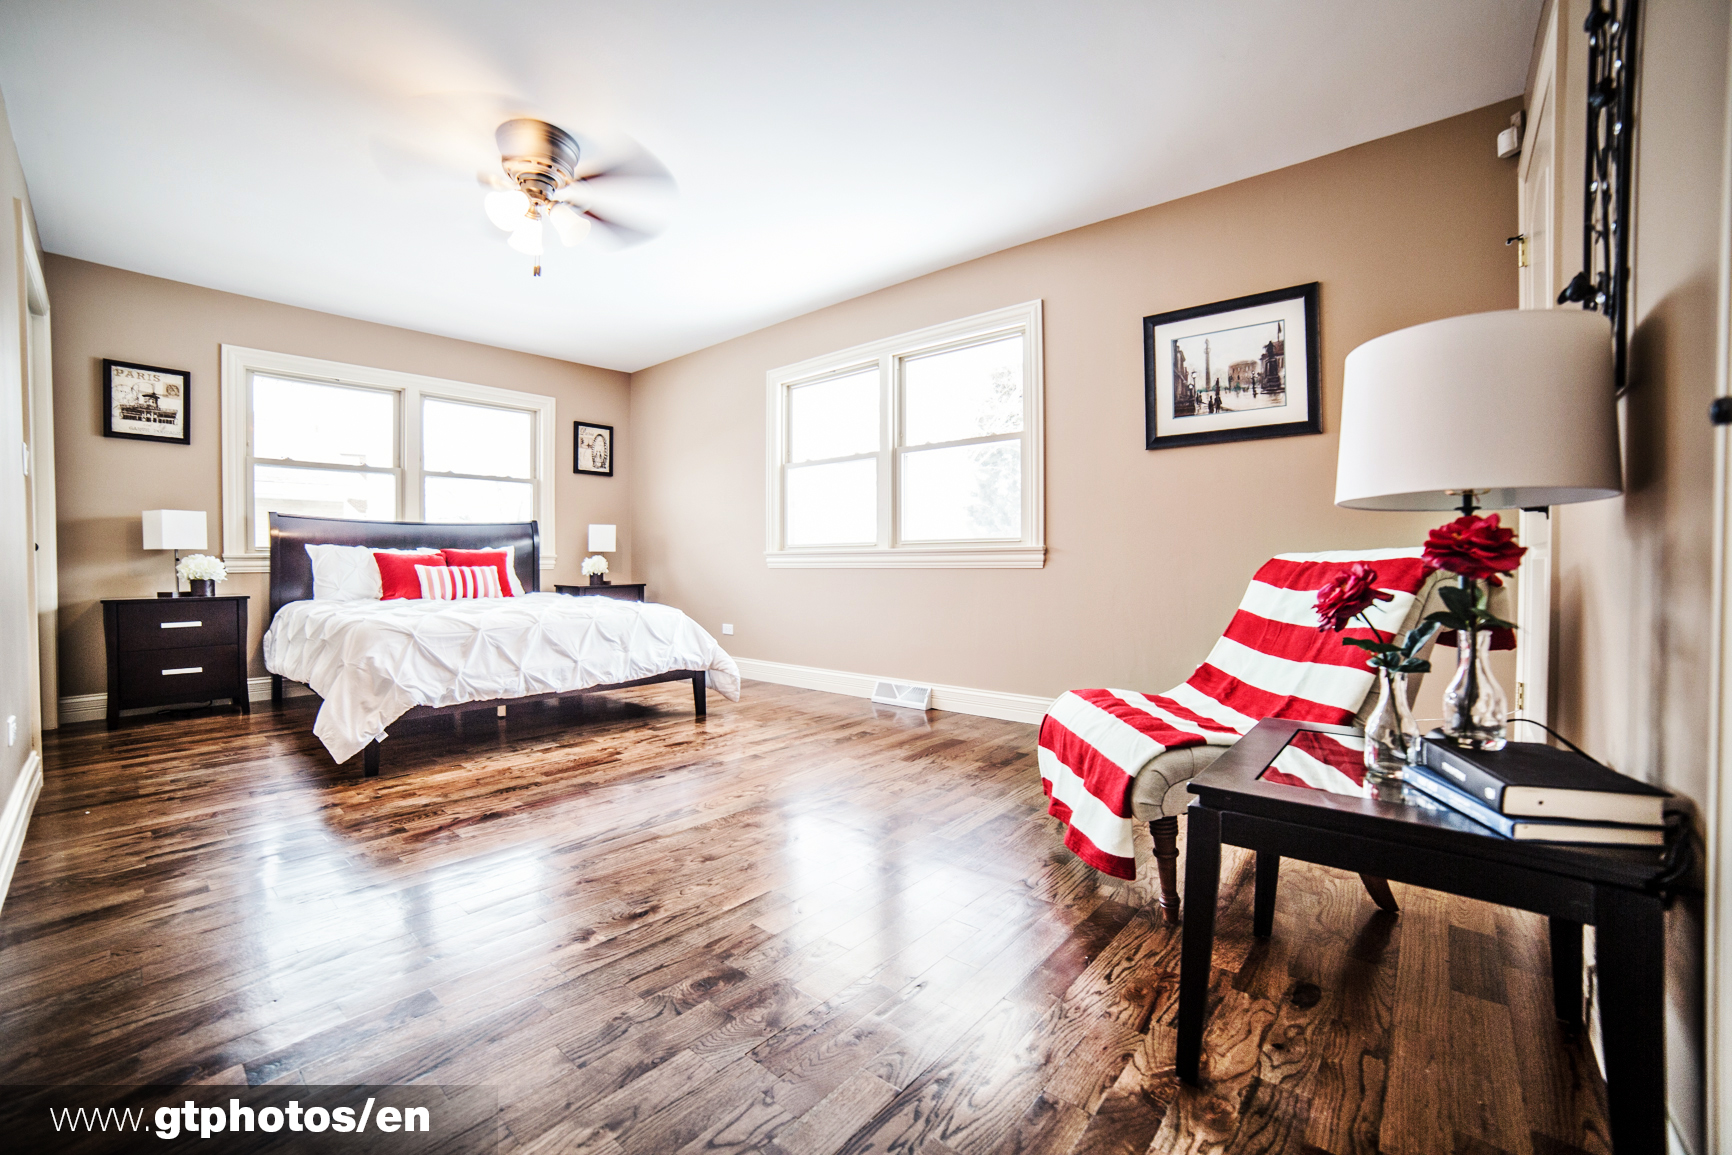 Bed Room Renovation Budget